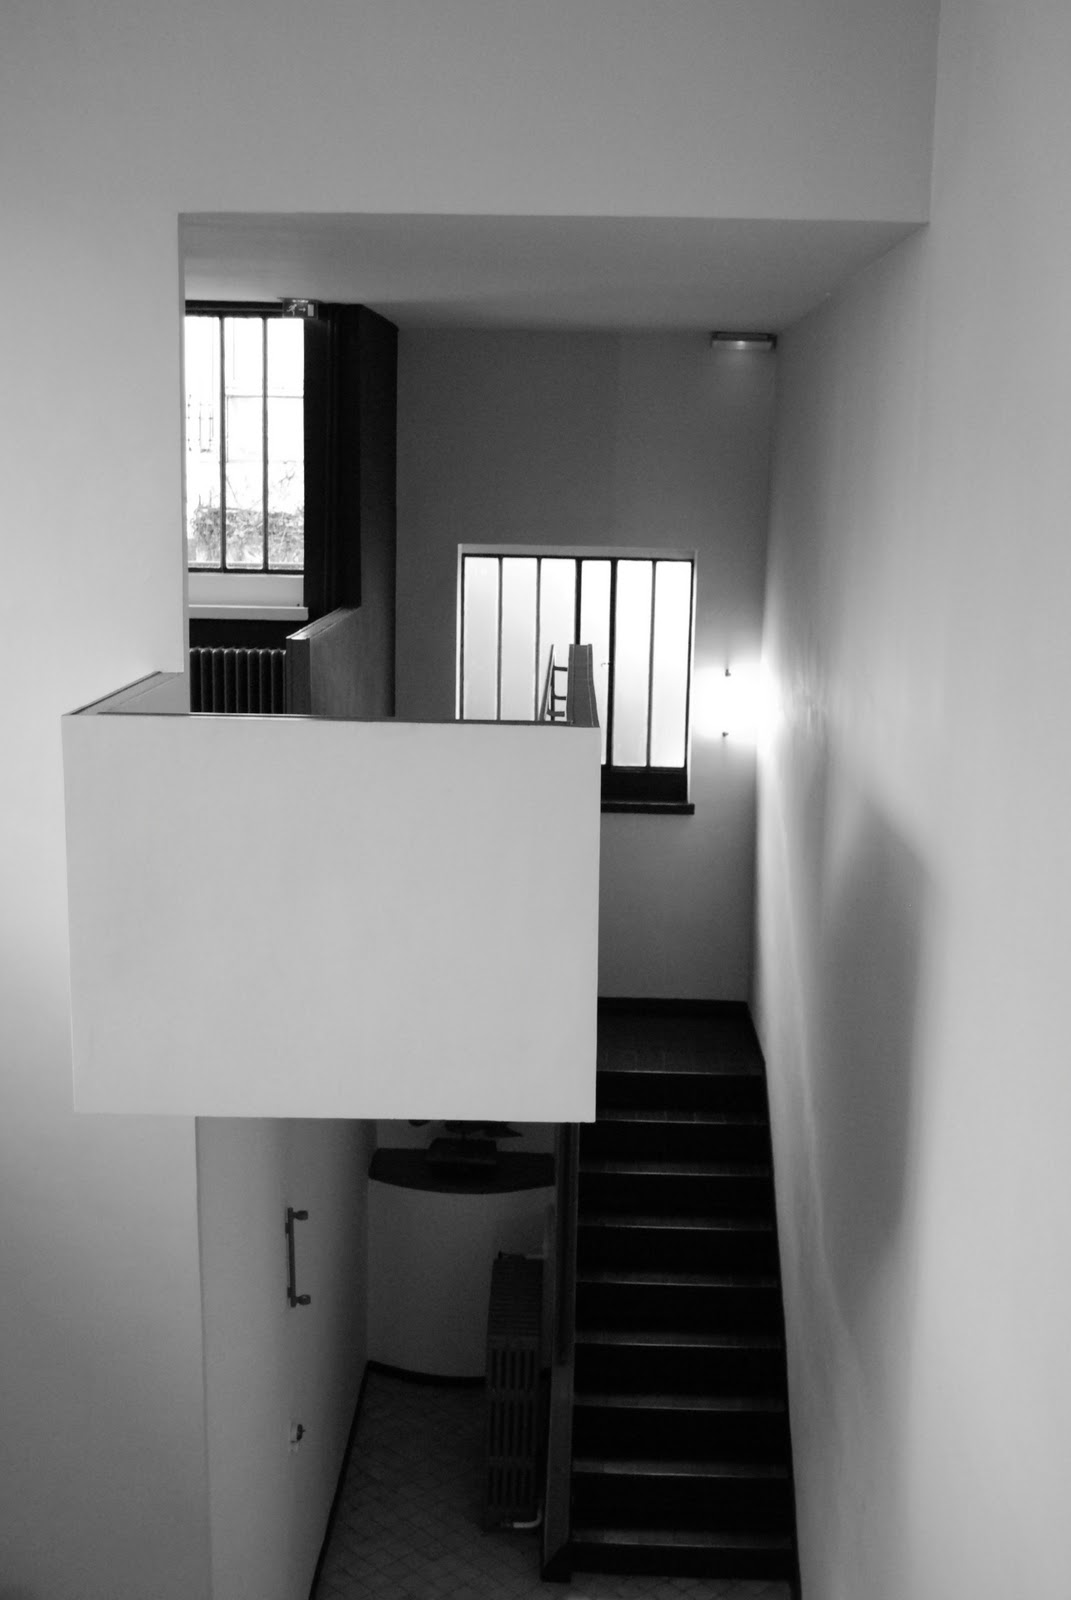 maison la roche le corbusier in paris cate st hill. Black Bedroom Furniture Sets. Home Design Ideas